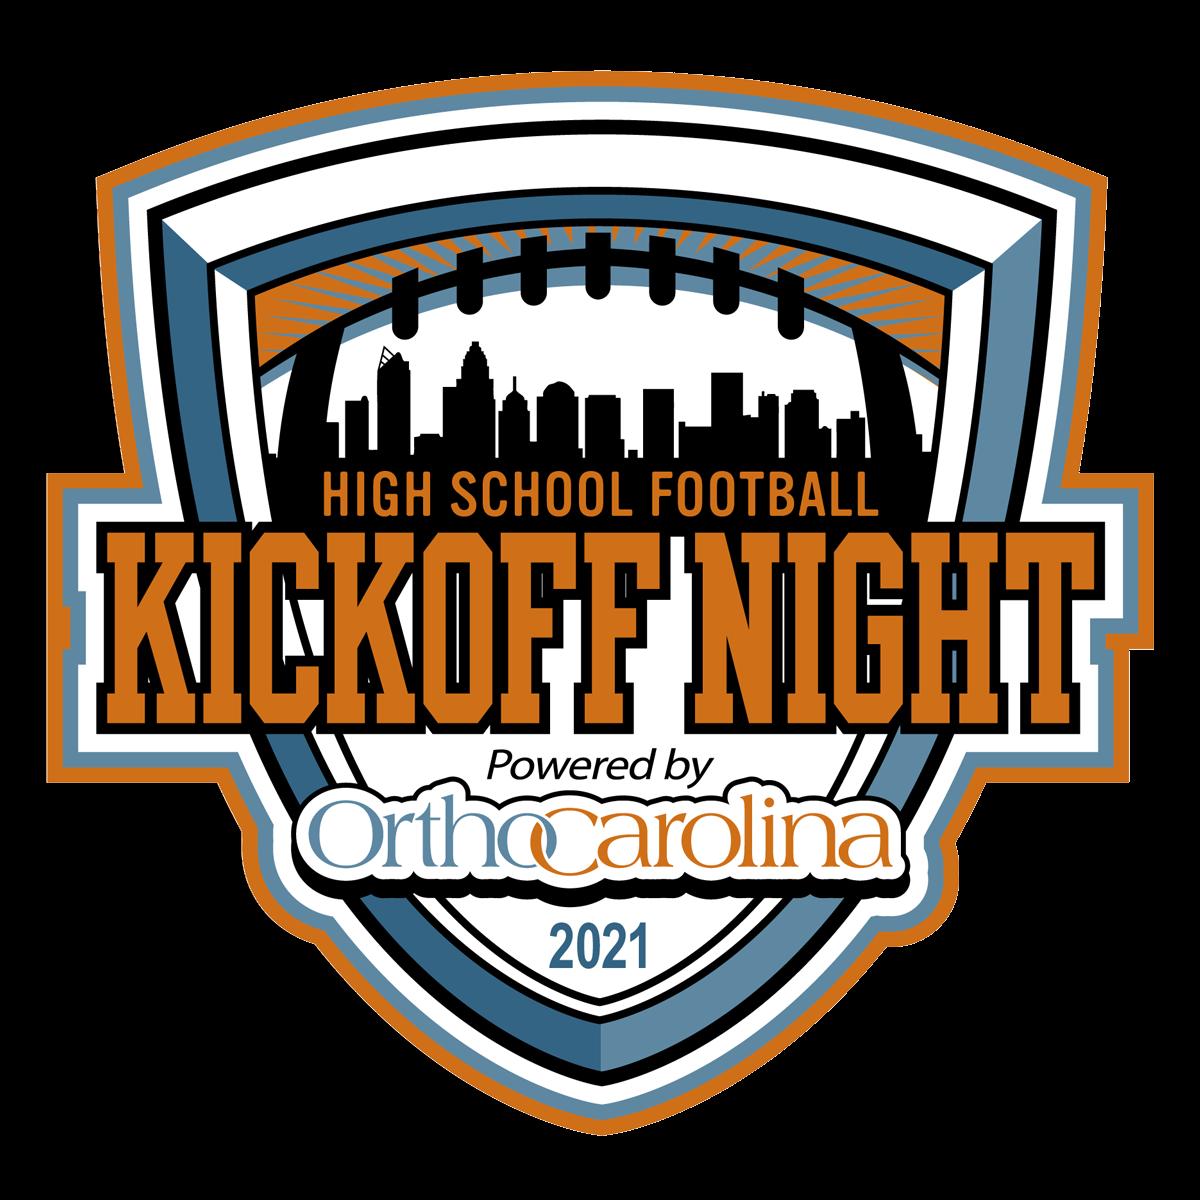 Charlotte Kickoff Night